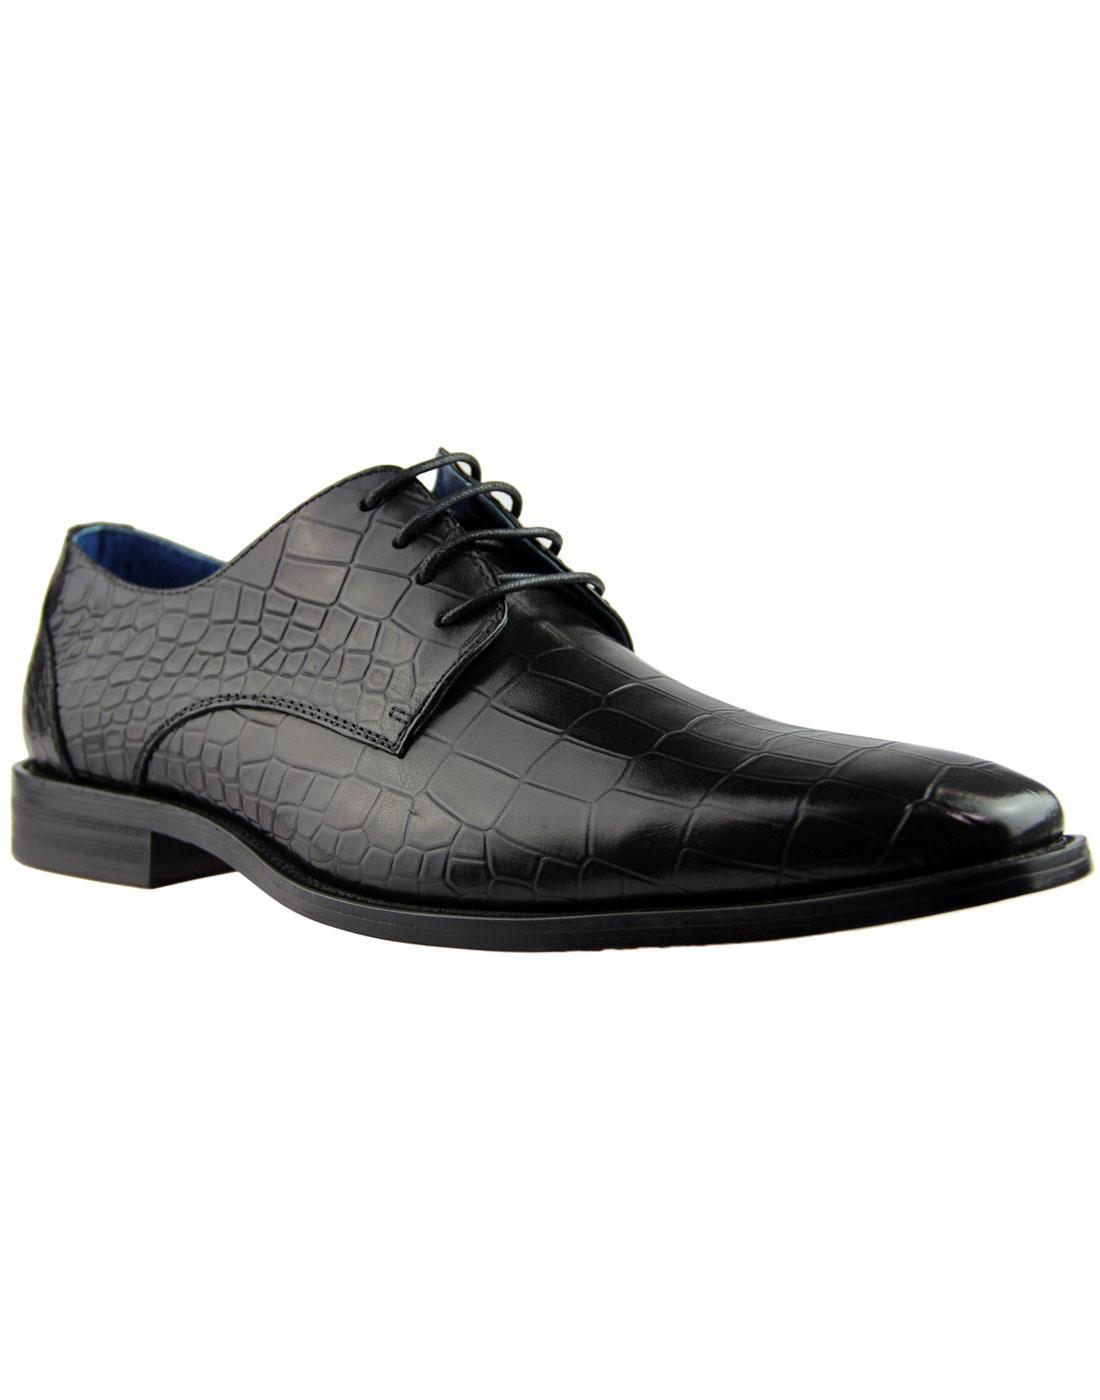 Teilo PAOLO VANDINI Croc Stamp Chisel Toe Shoes B